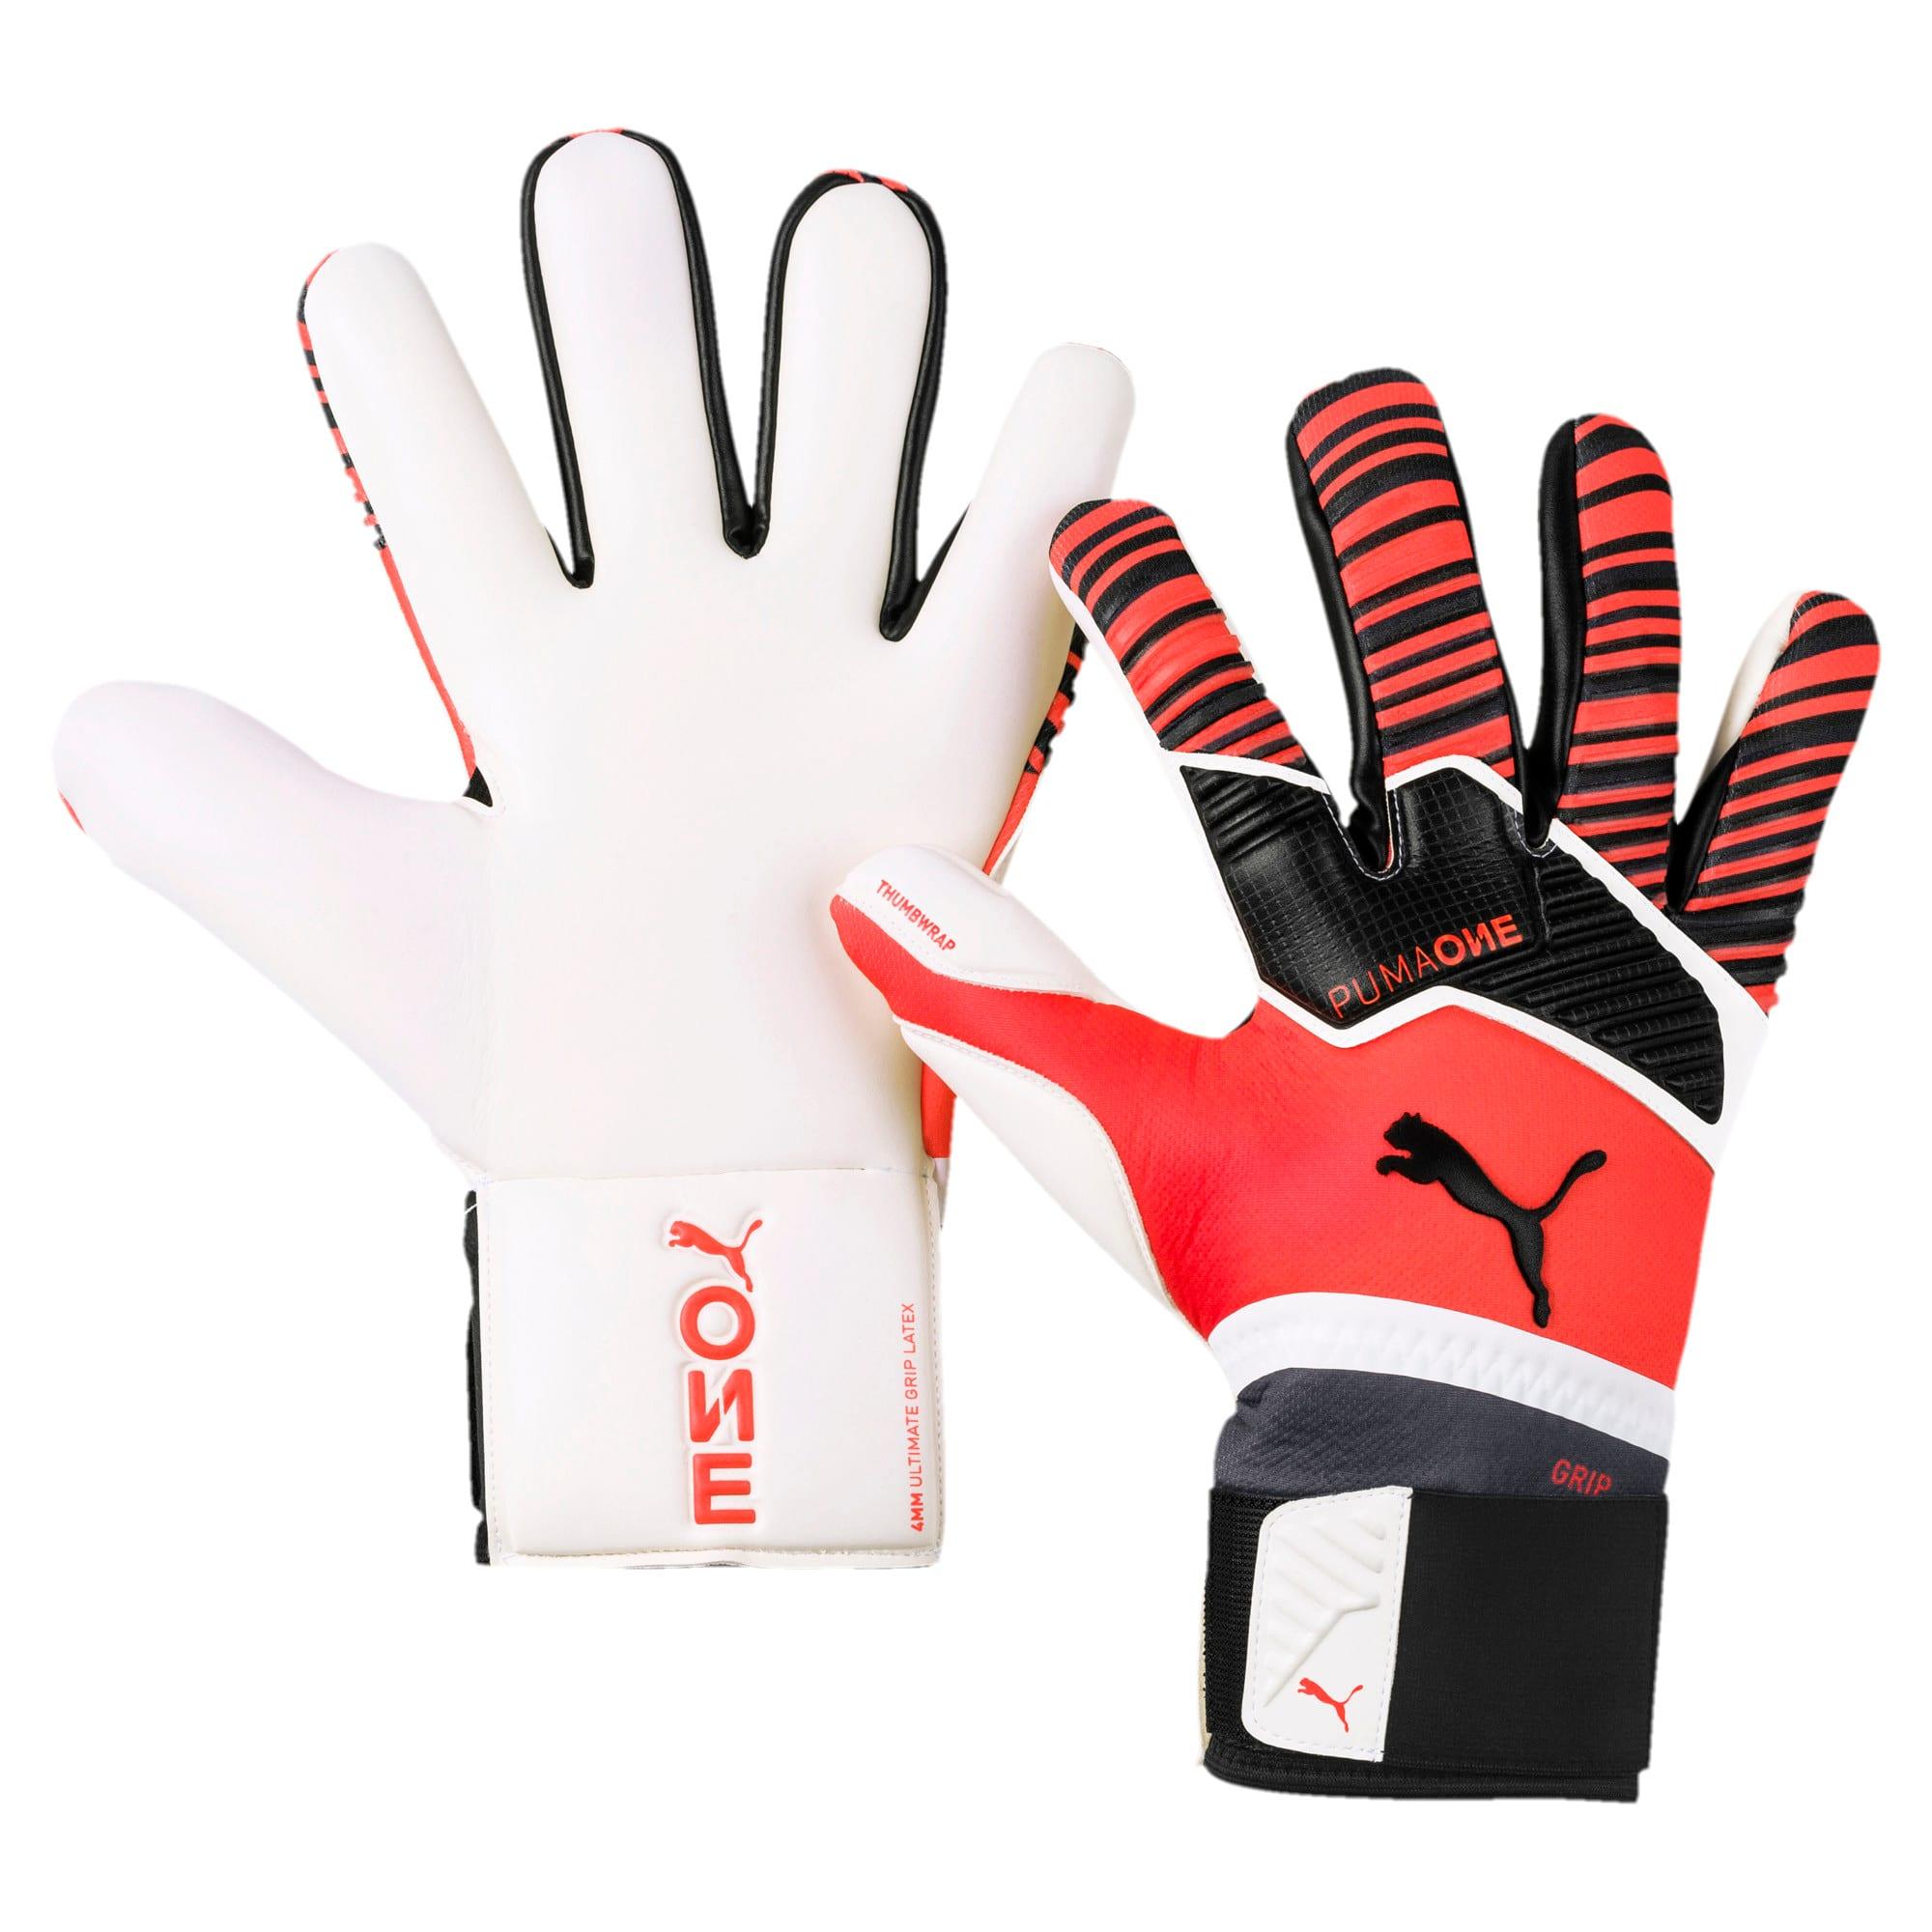 Thumbnail 1 of Gants de goal de foot PUMA ONE Grip 1 Hybrid Pro, Nrgy Red-Black-White, medium